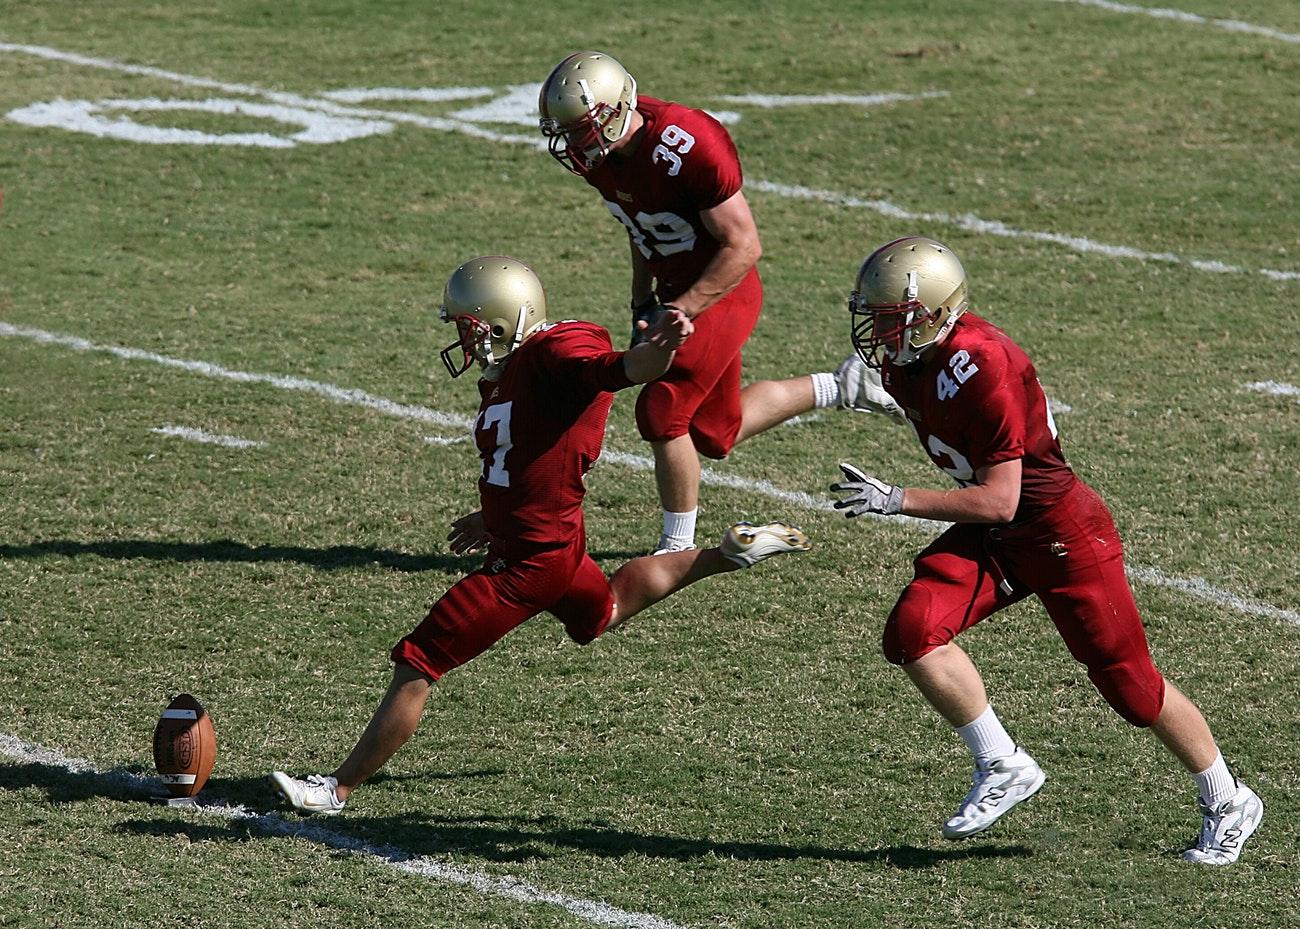 Football Kickoff (Unsplash-Keith Johnston)